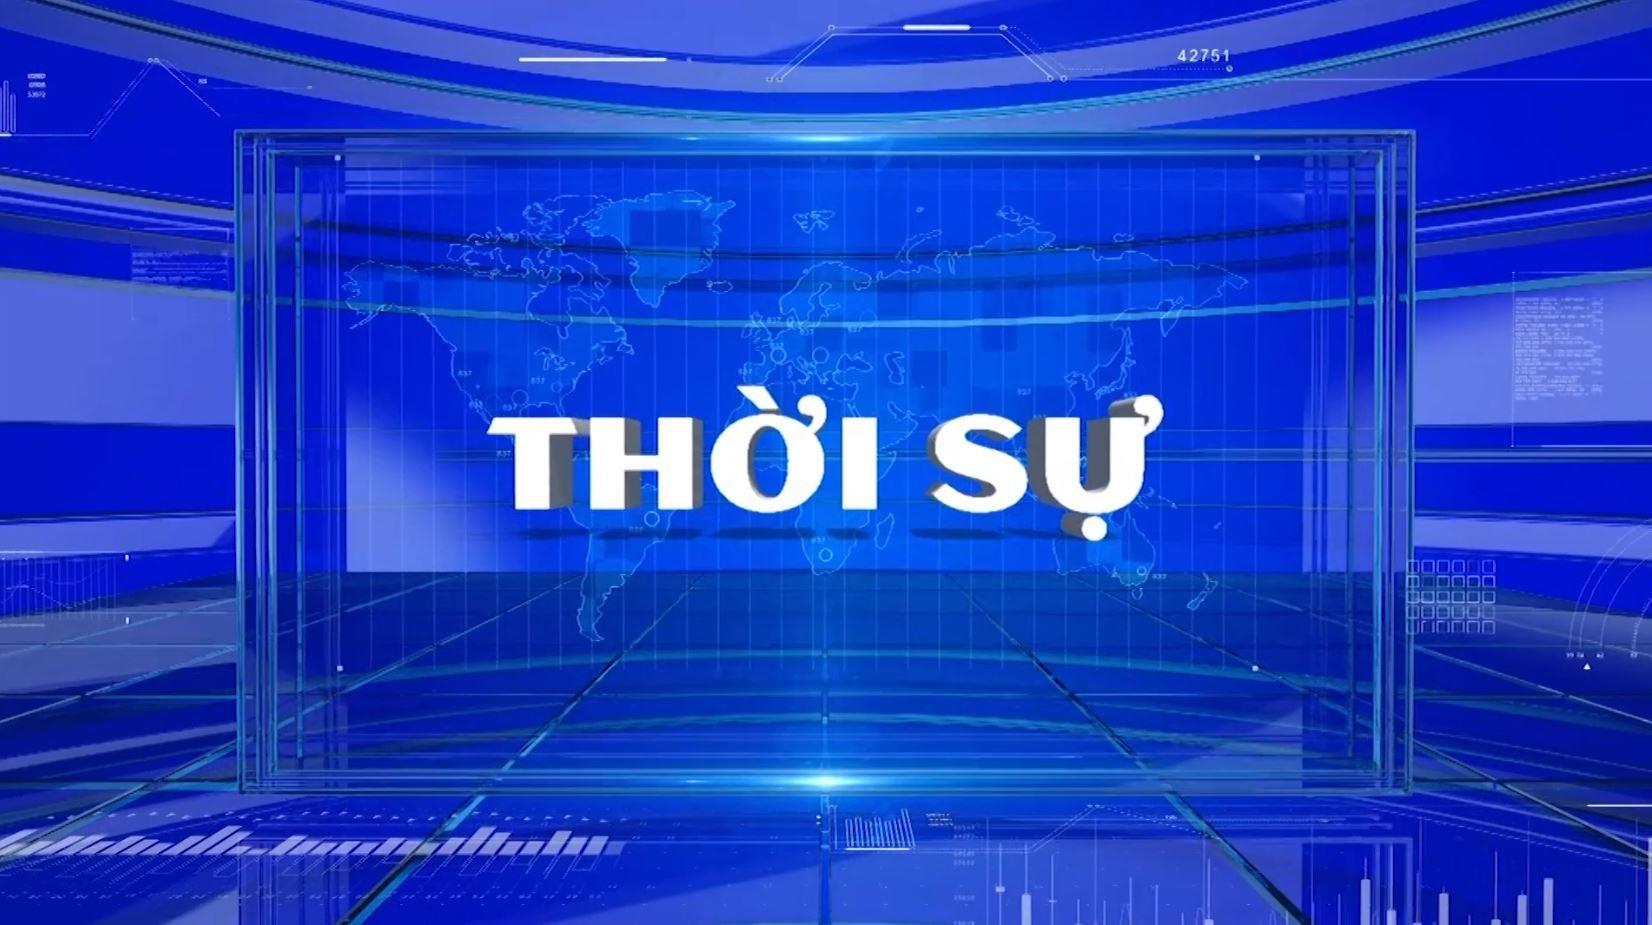 Thời sự 18h30 T3 (19-11-2019)